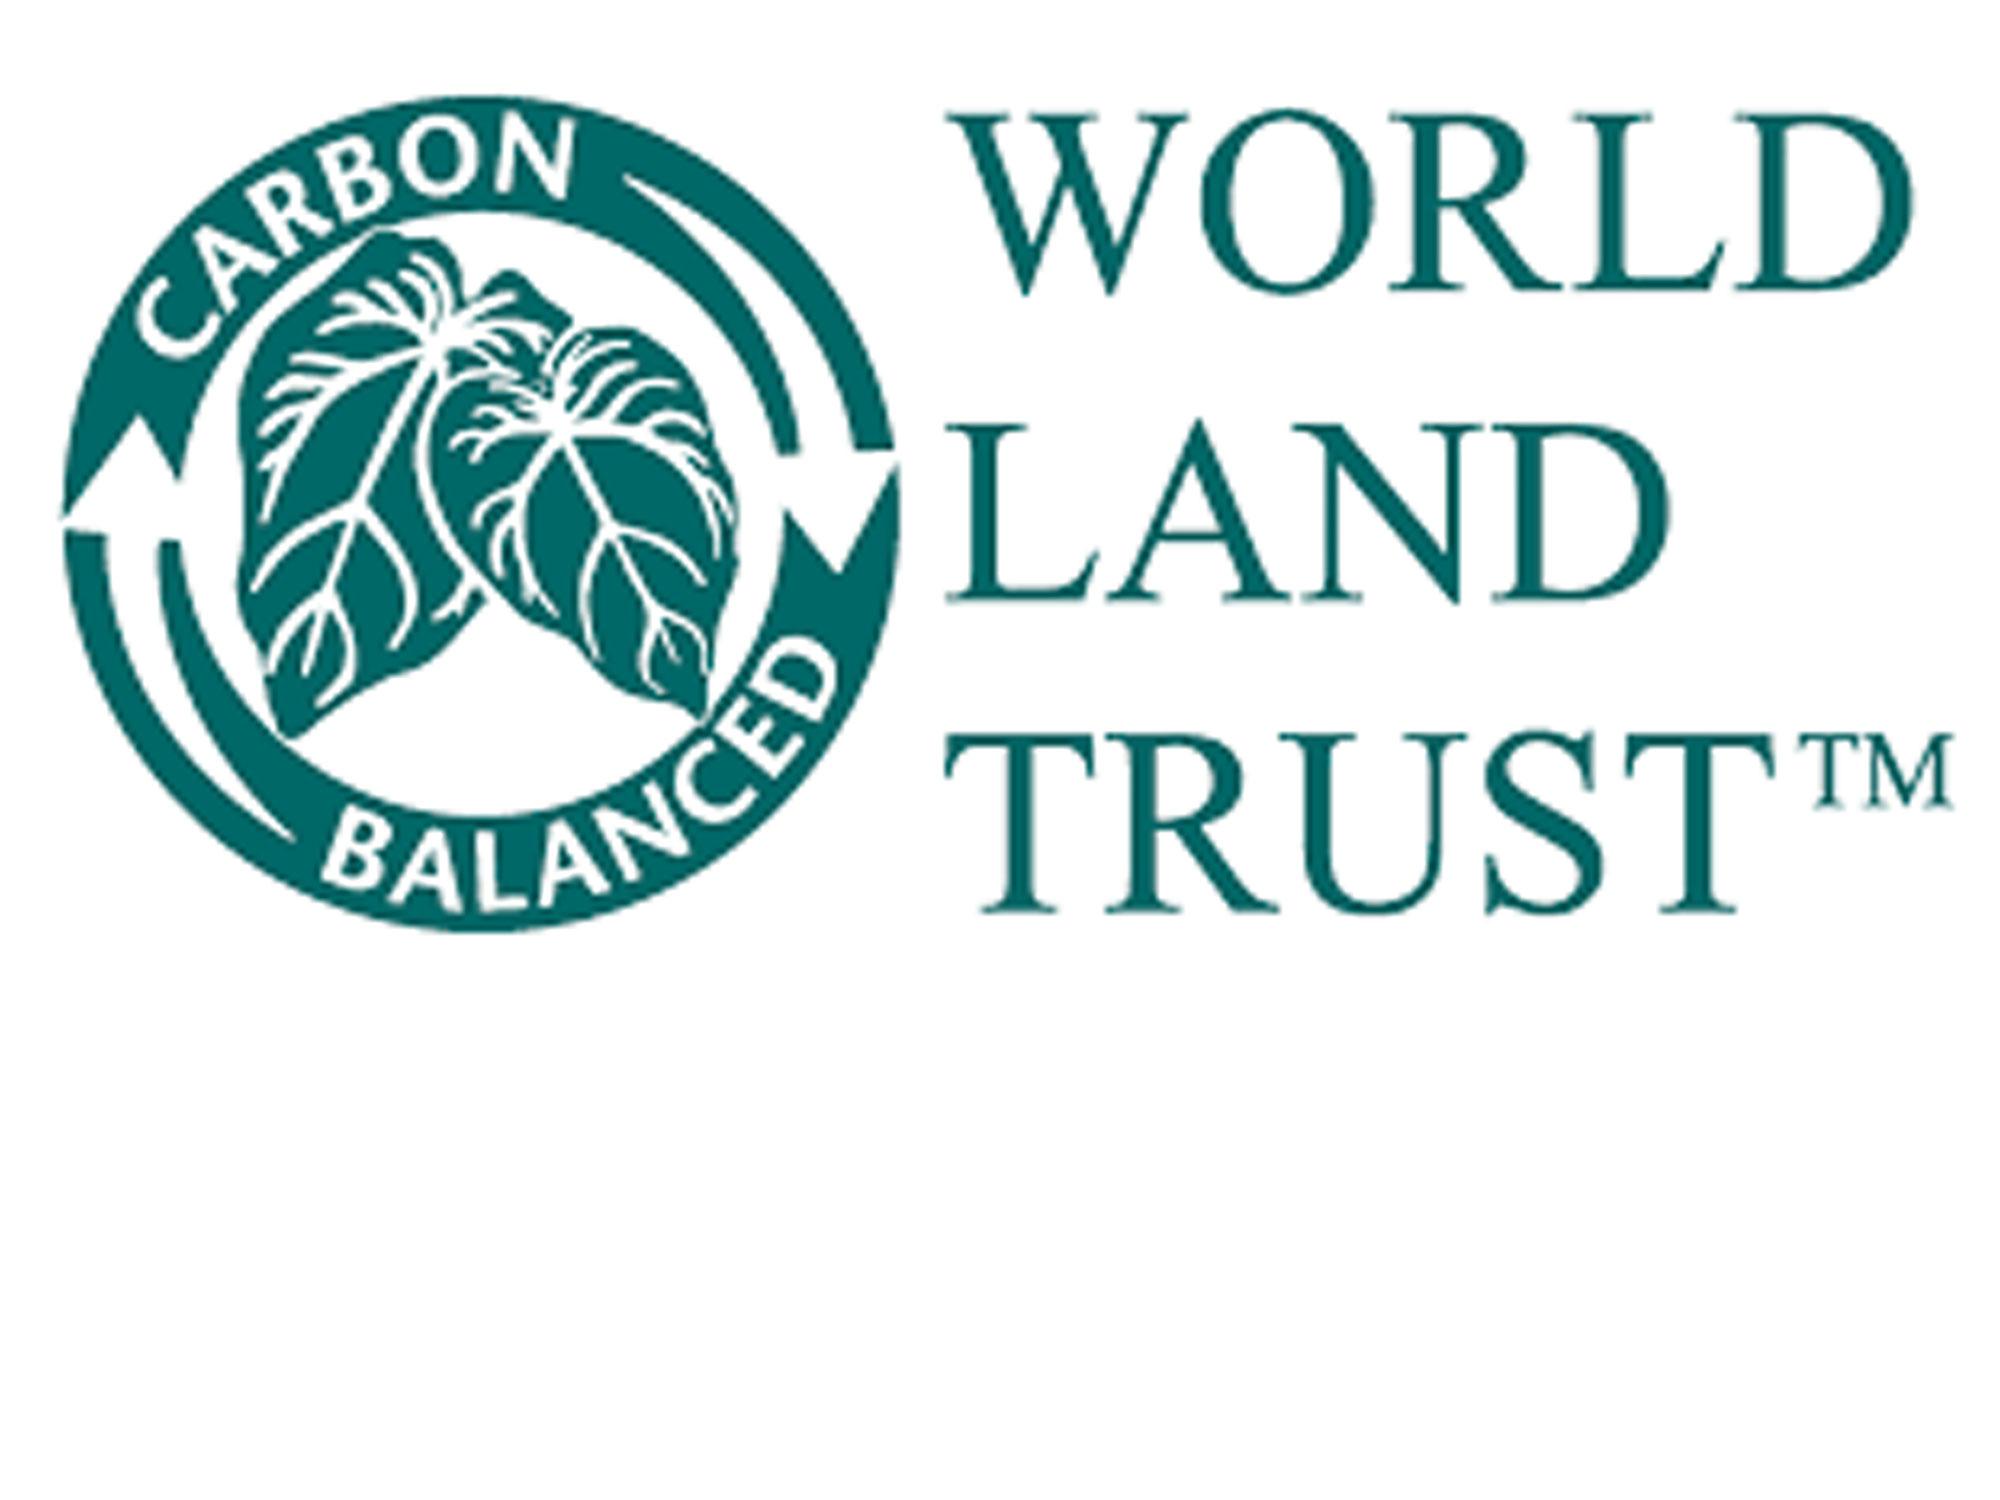 World land trust - renewable energy brokerage